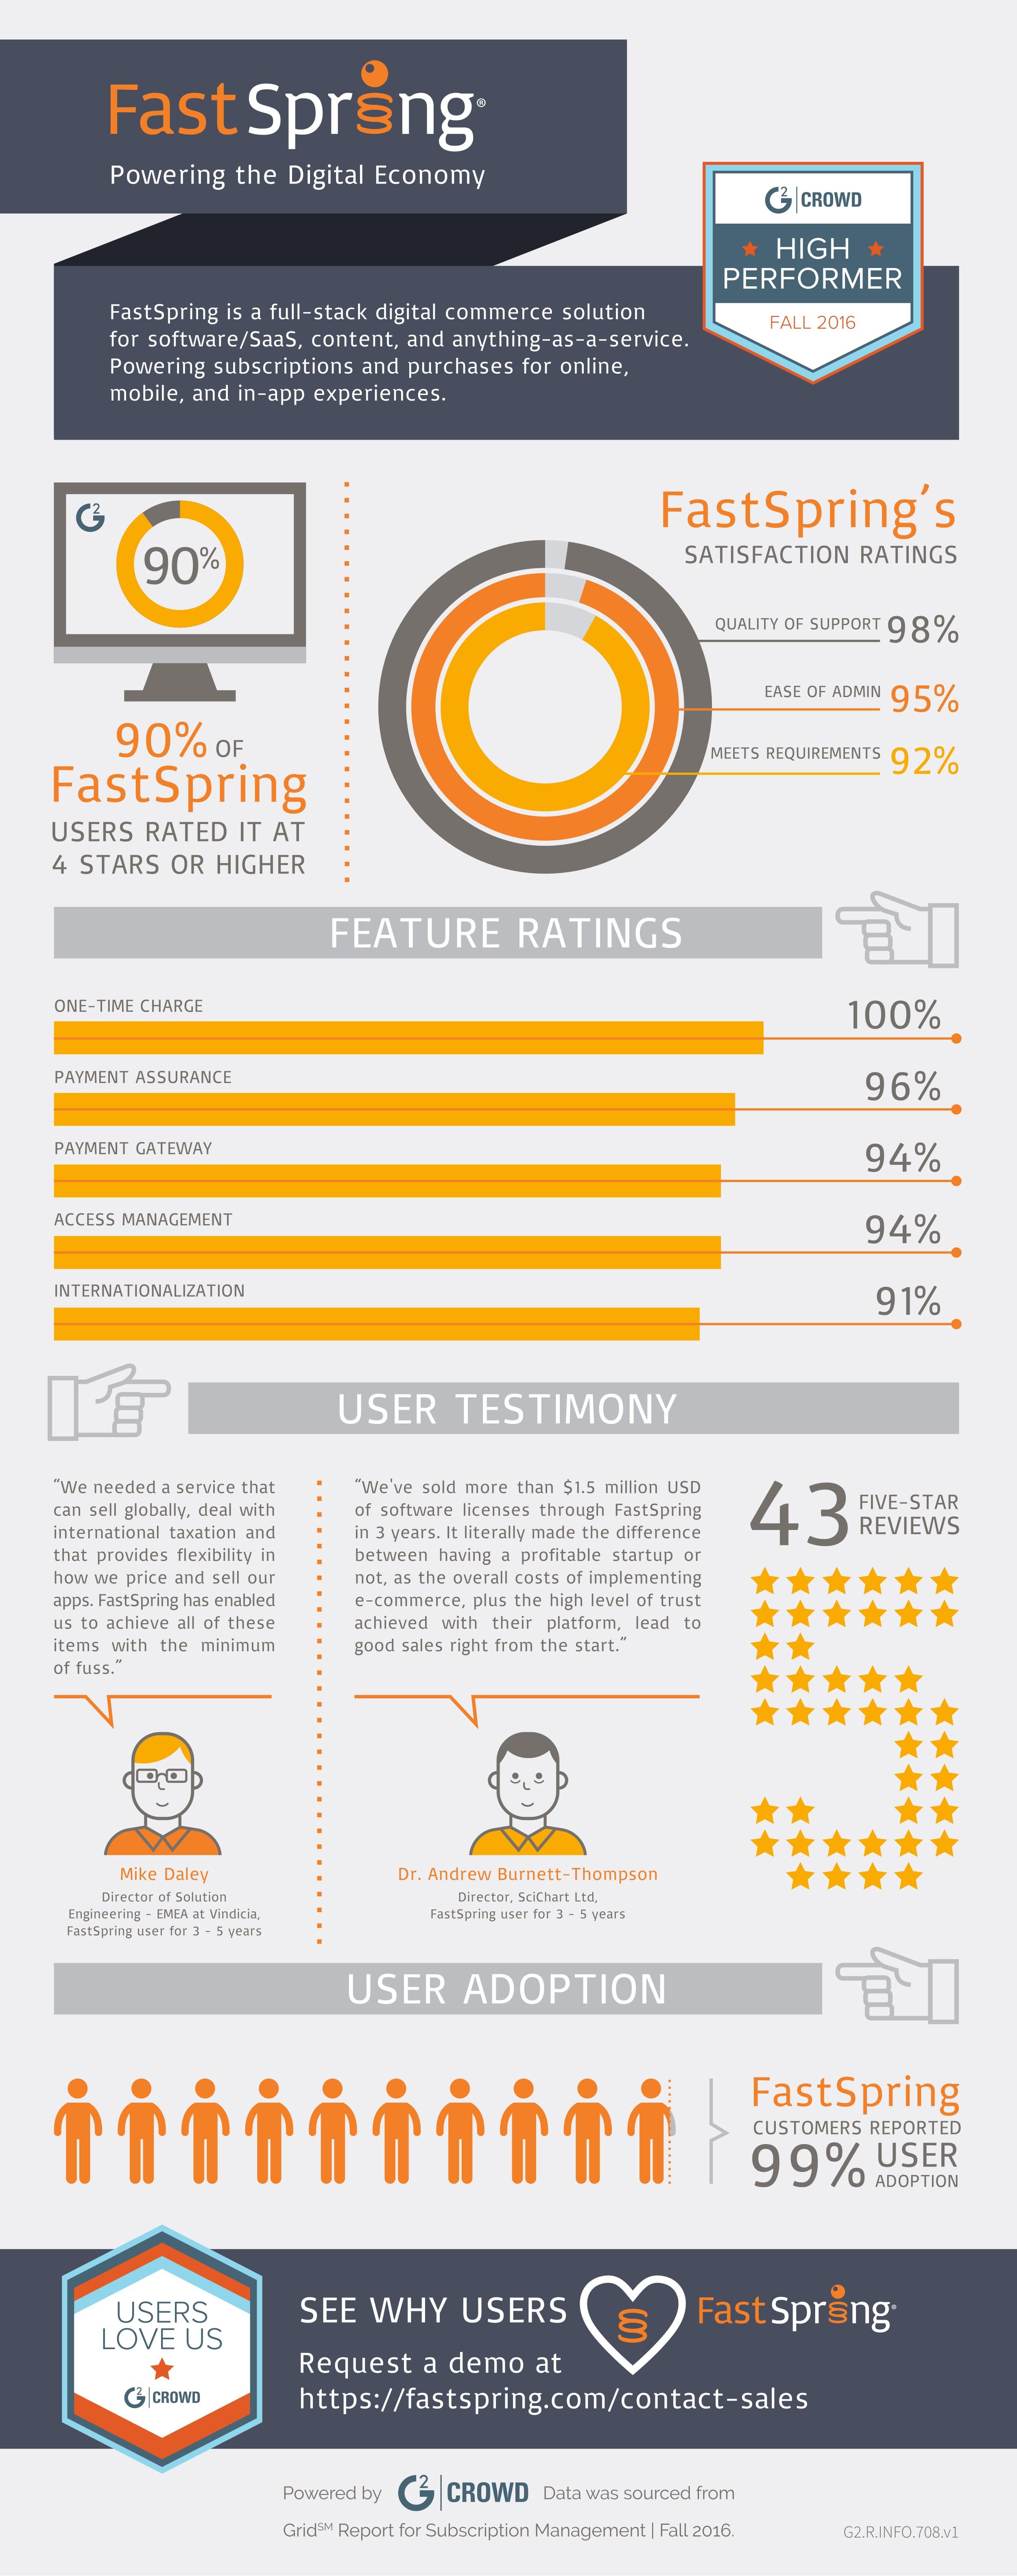 FastSpring_Infographic_02-1.jpg